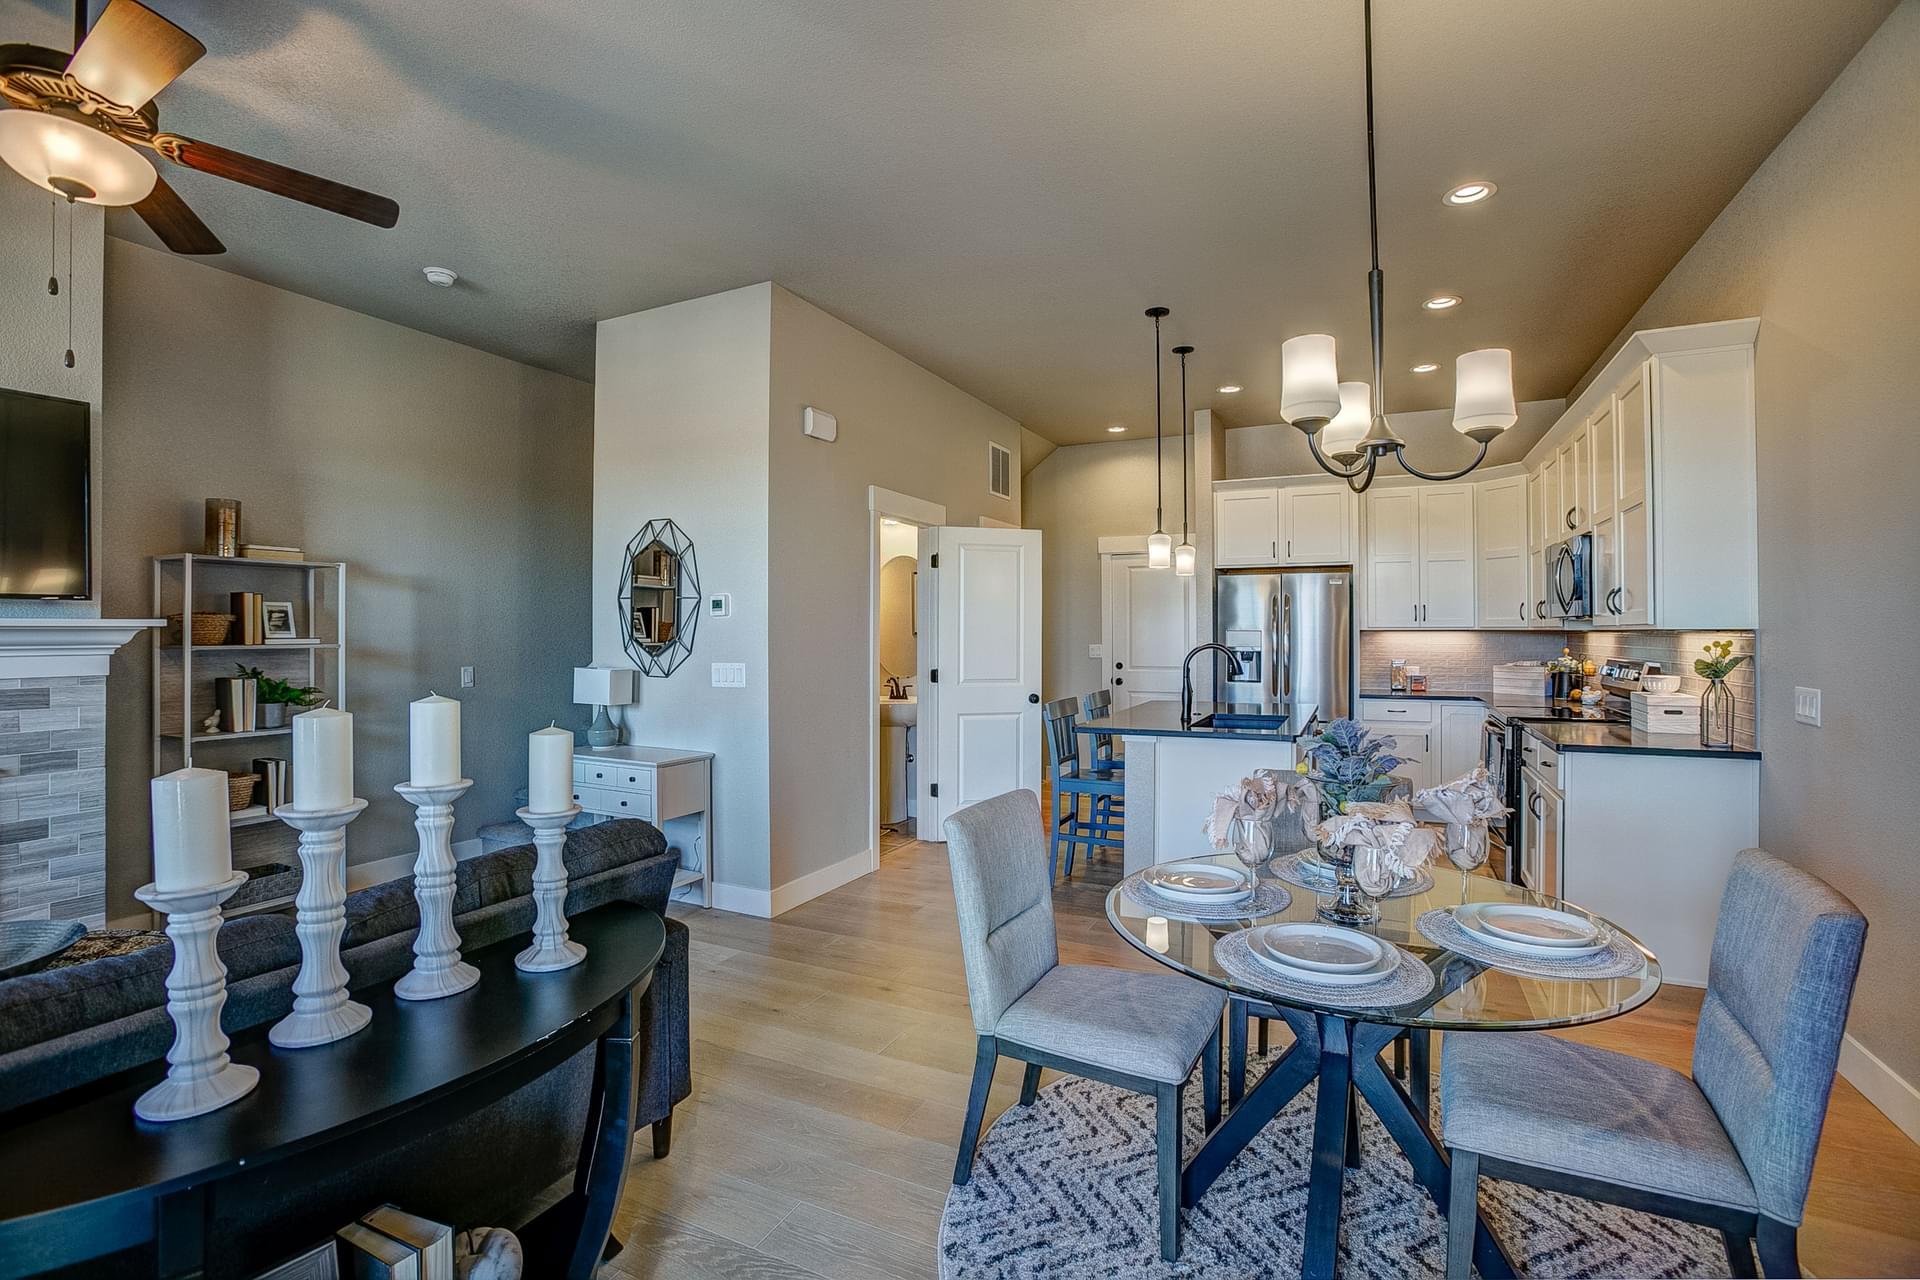 2br New Home in Loveland, CO